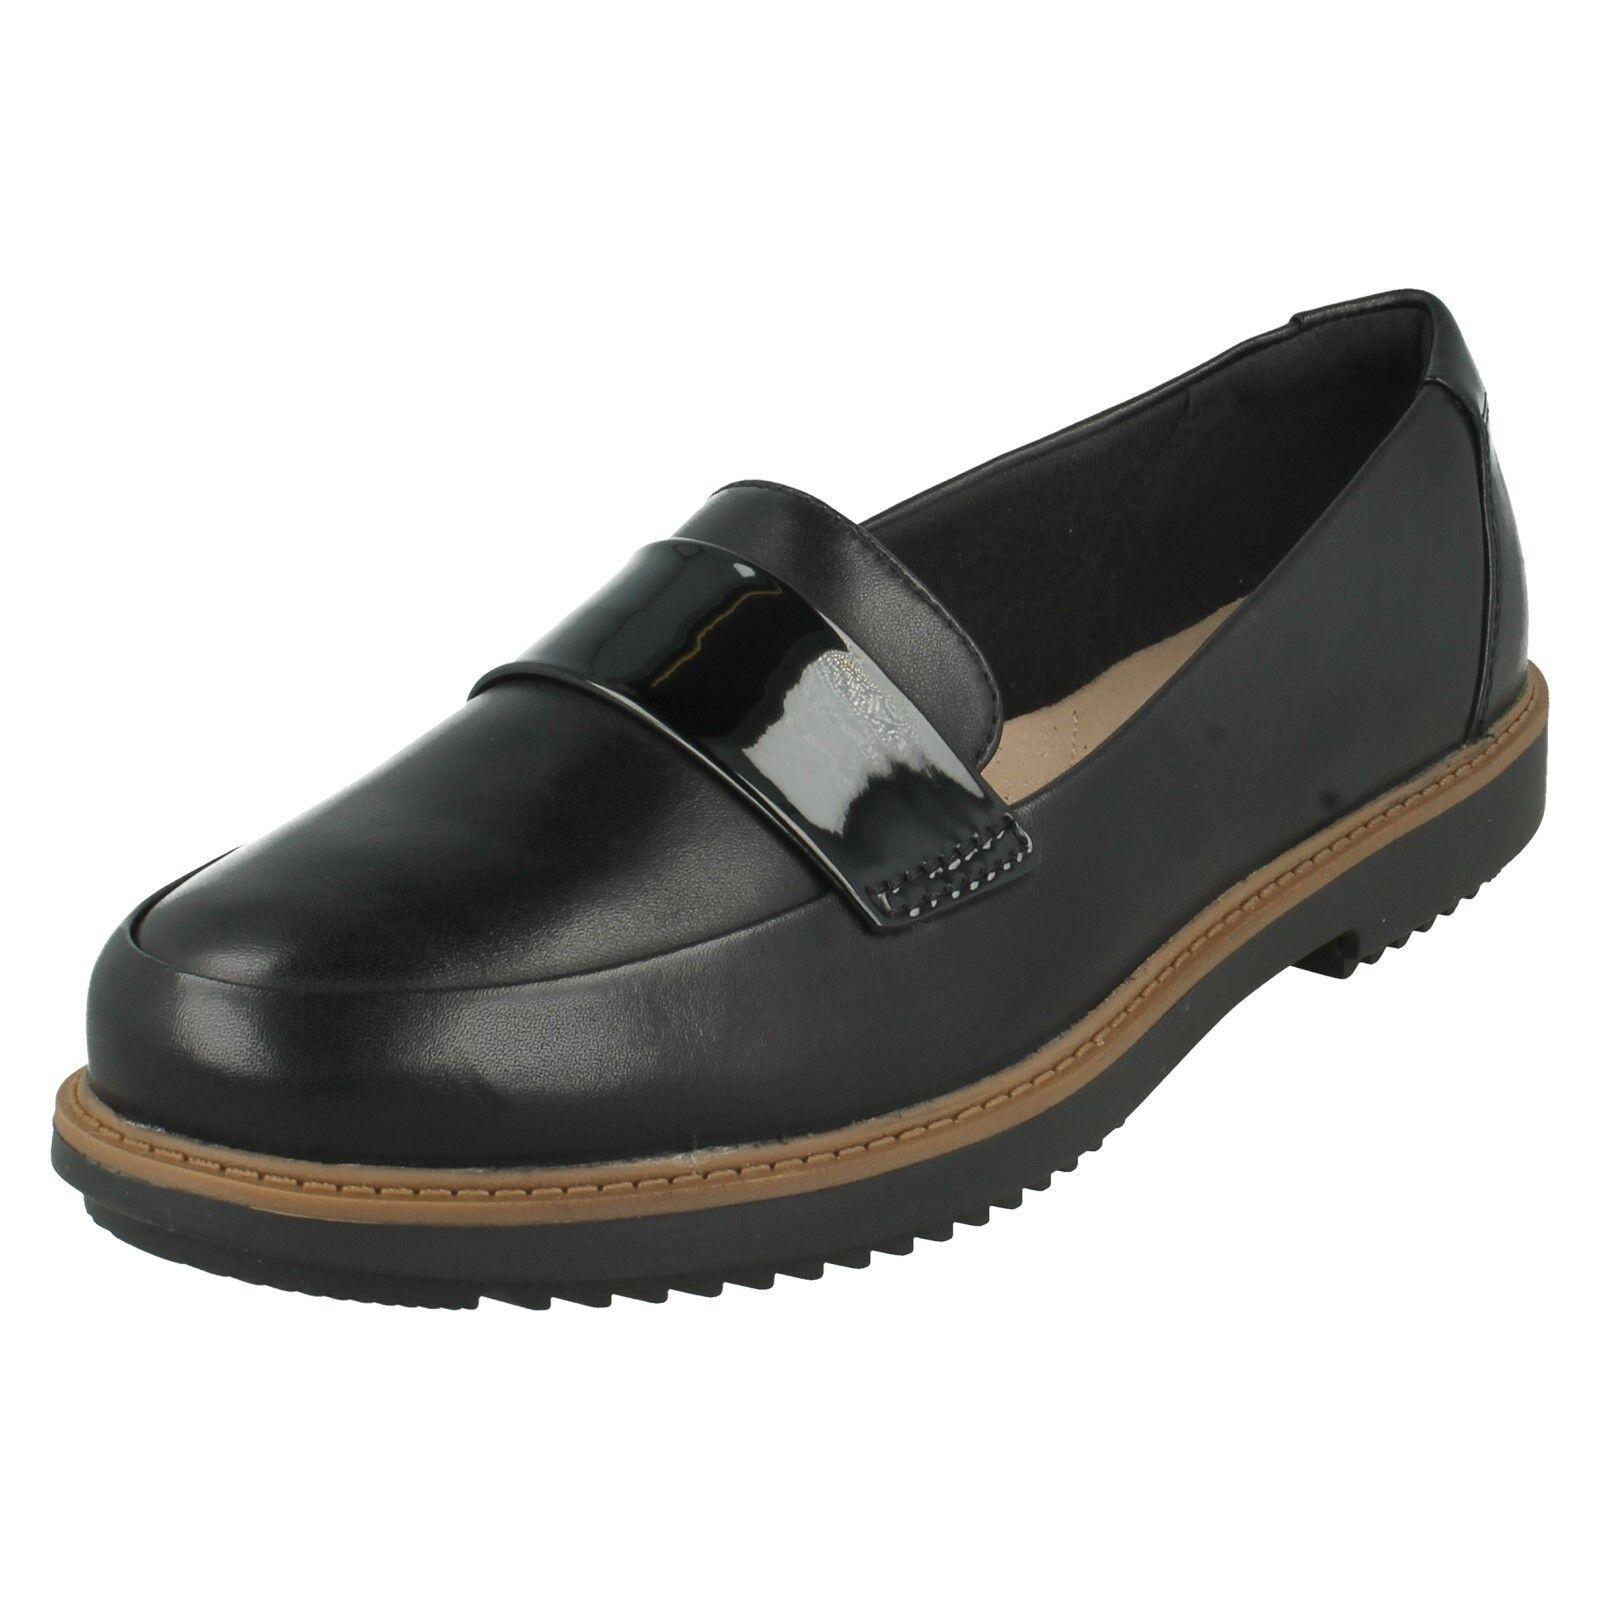 LADIES CLARKS SLIP ON SMART FORMAL FLAT LEATHER ARLIE LOAFERS PUMPS Schuhe RAISIE ARLIE LEATHER bc0bcc